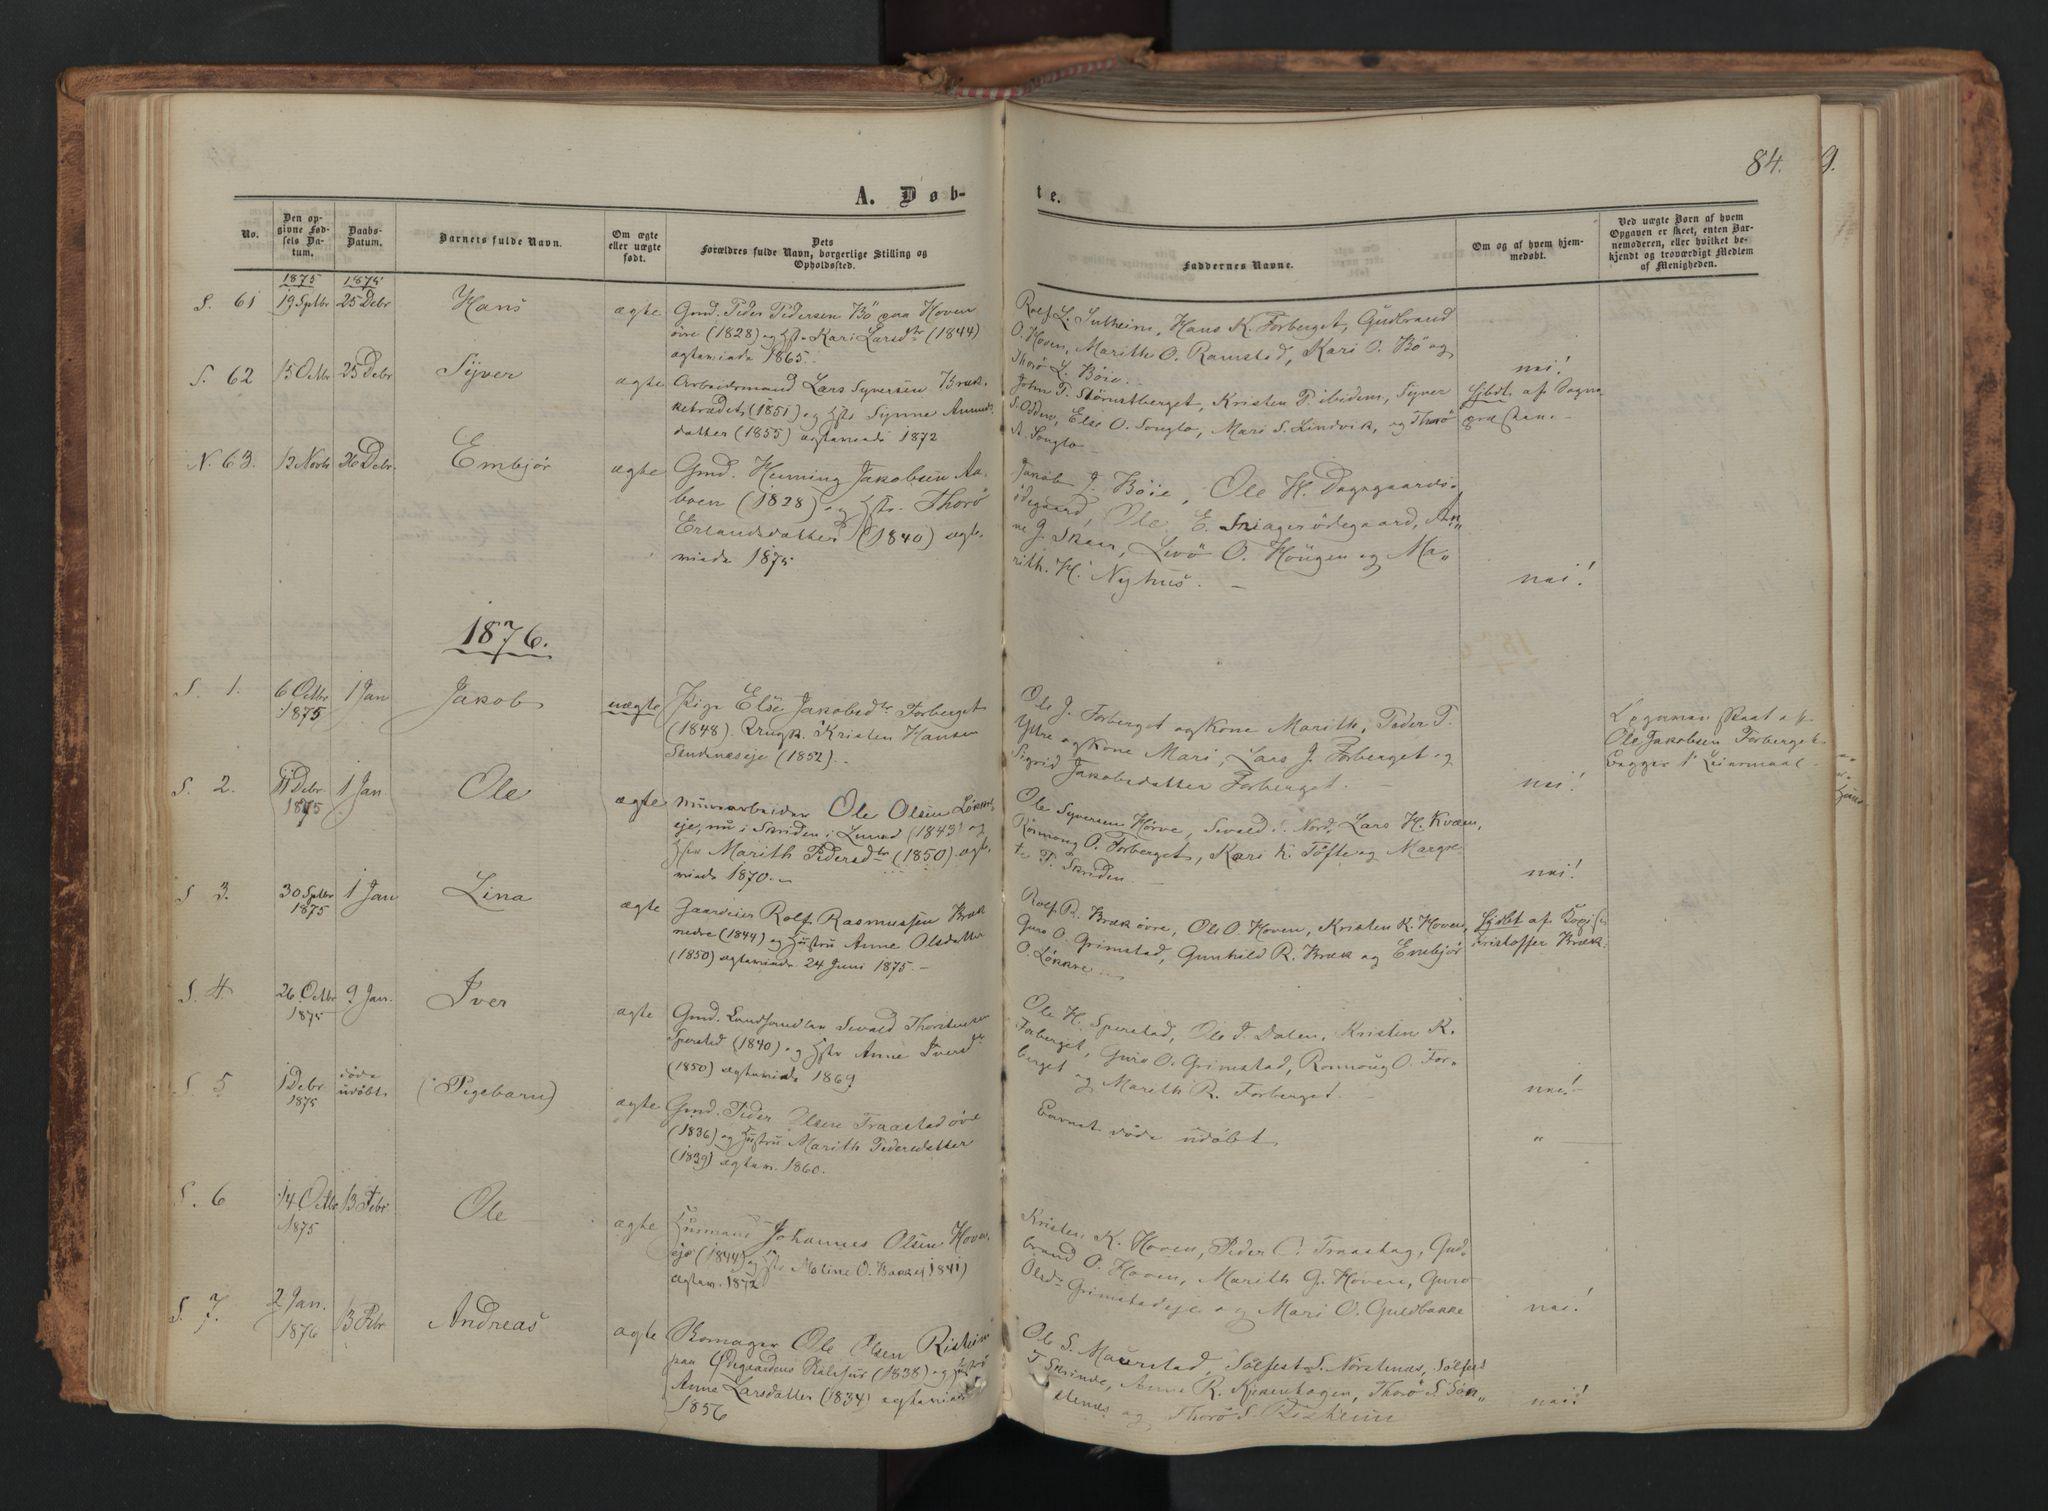 SAH, Skjåk prestekontor, Ministerialbok nr. 1, 1863-1879, s. 84